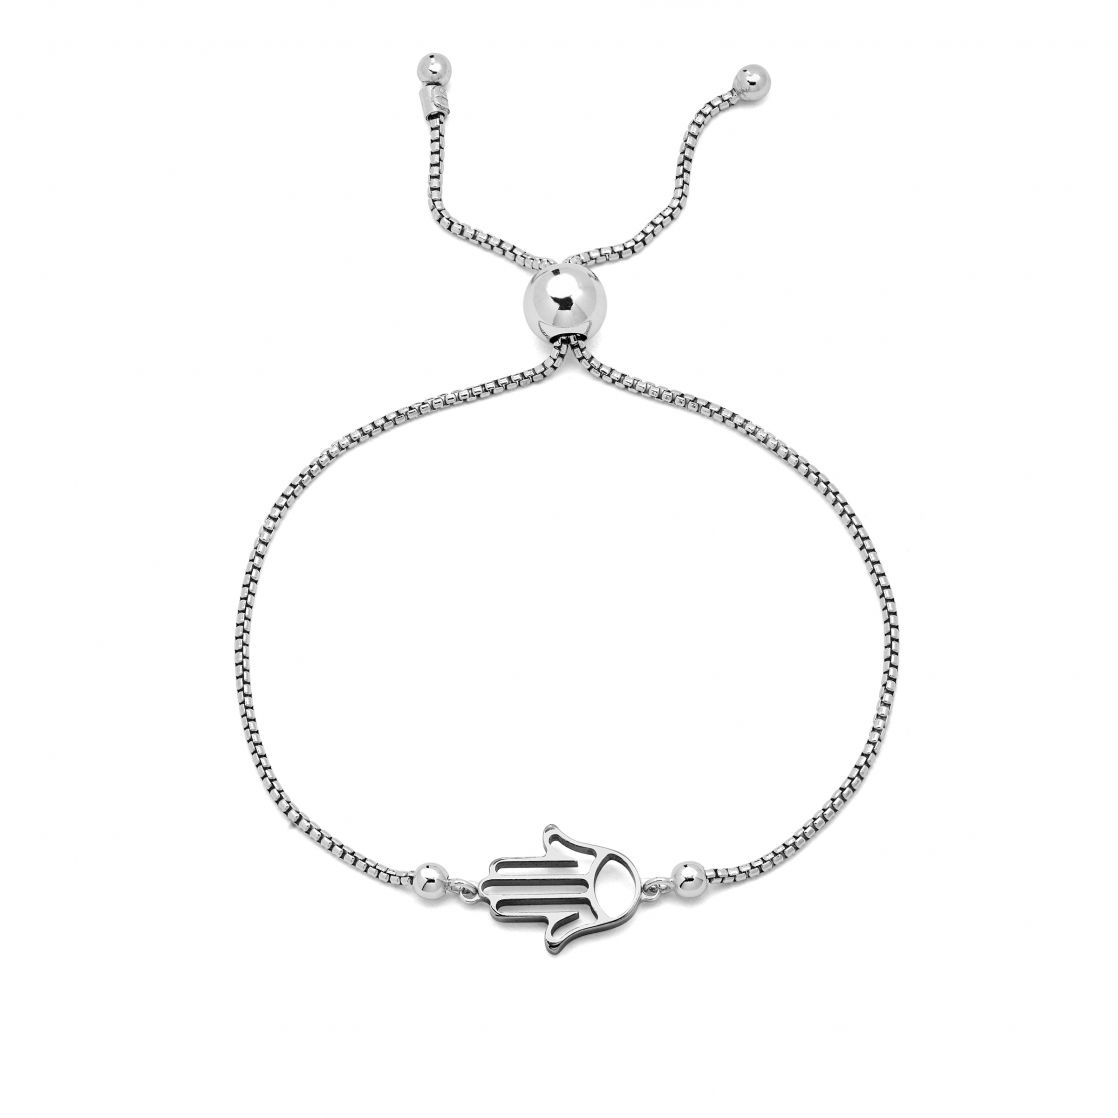 Sliding bracelet with hamnsa